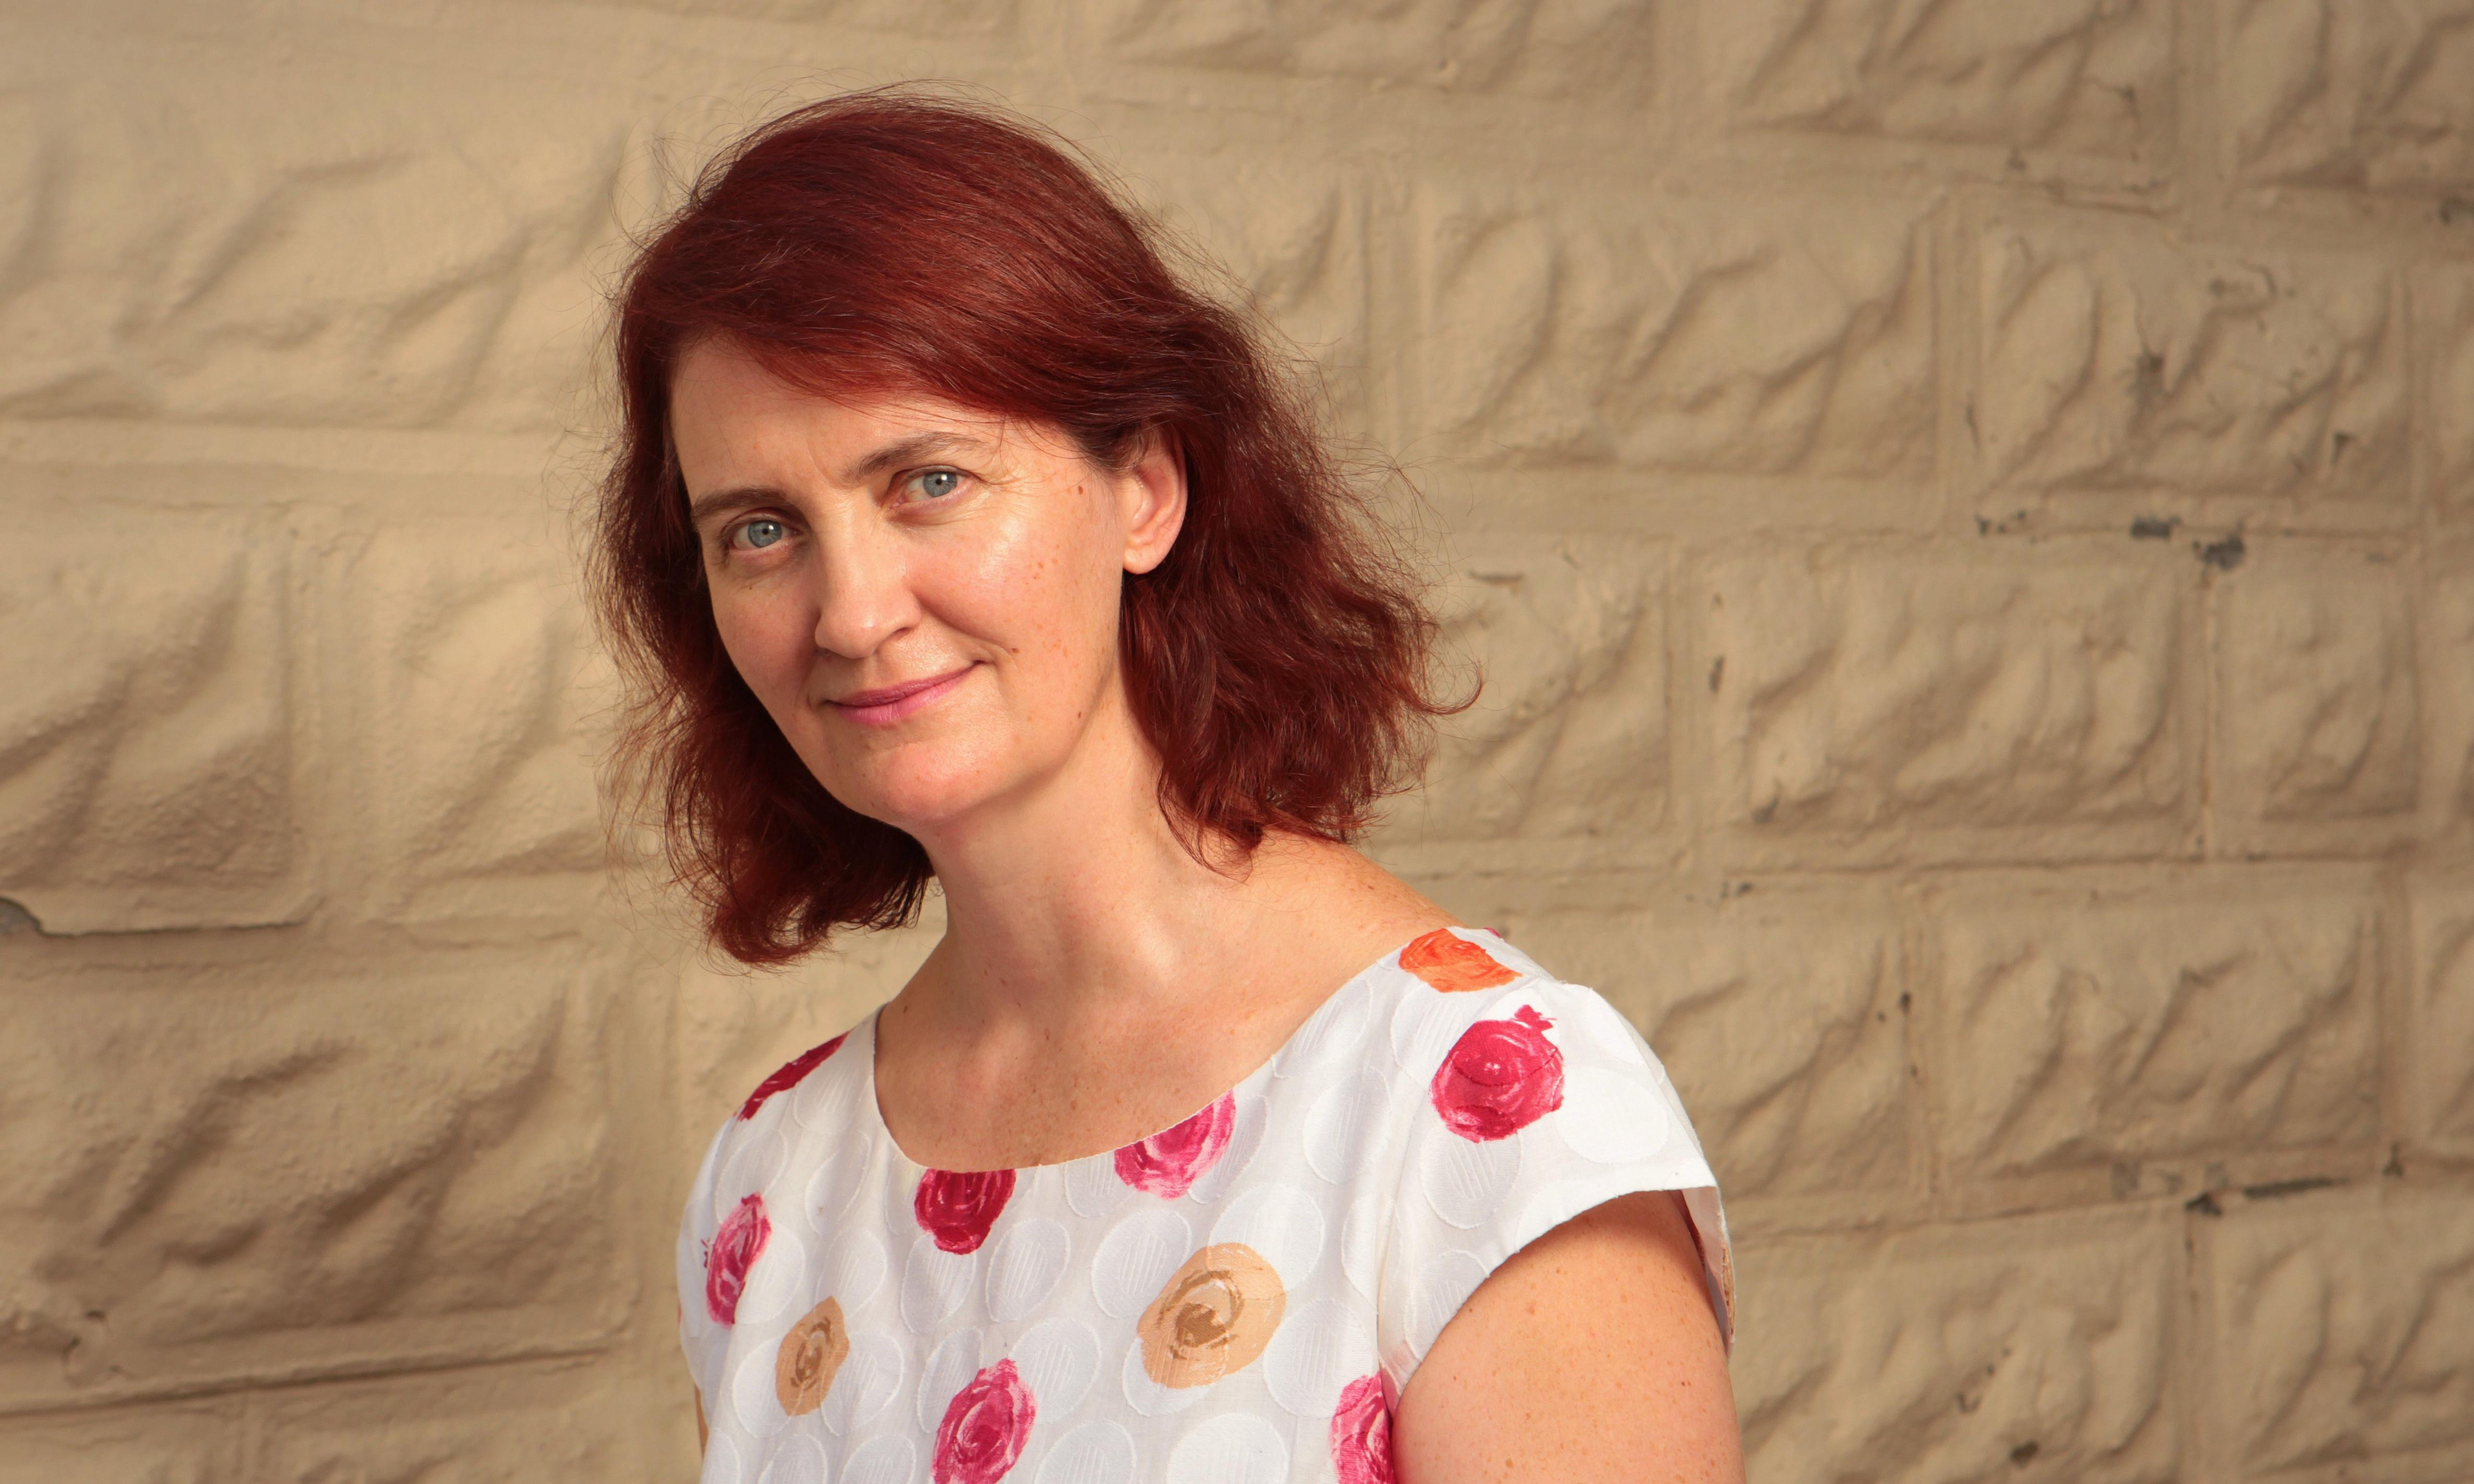 On my radar: Emma Donoghue's cultural highlights